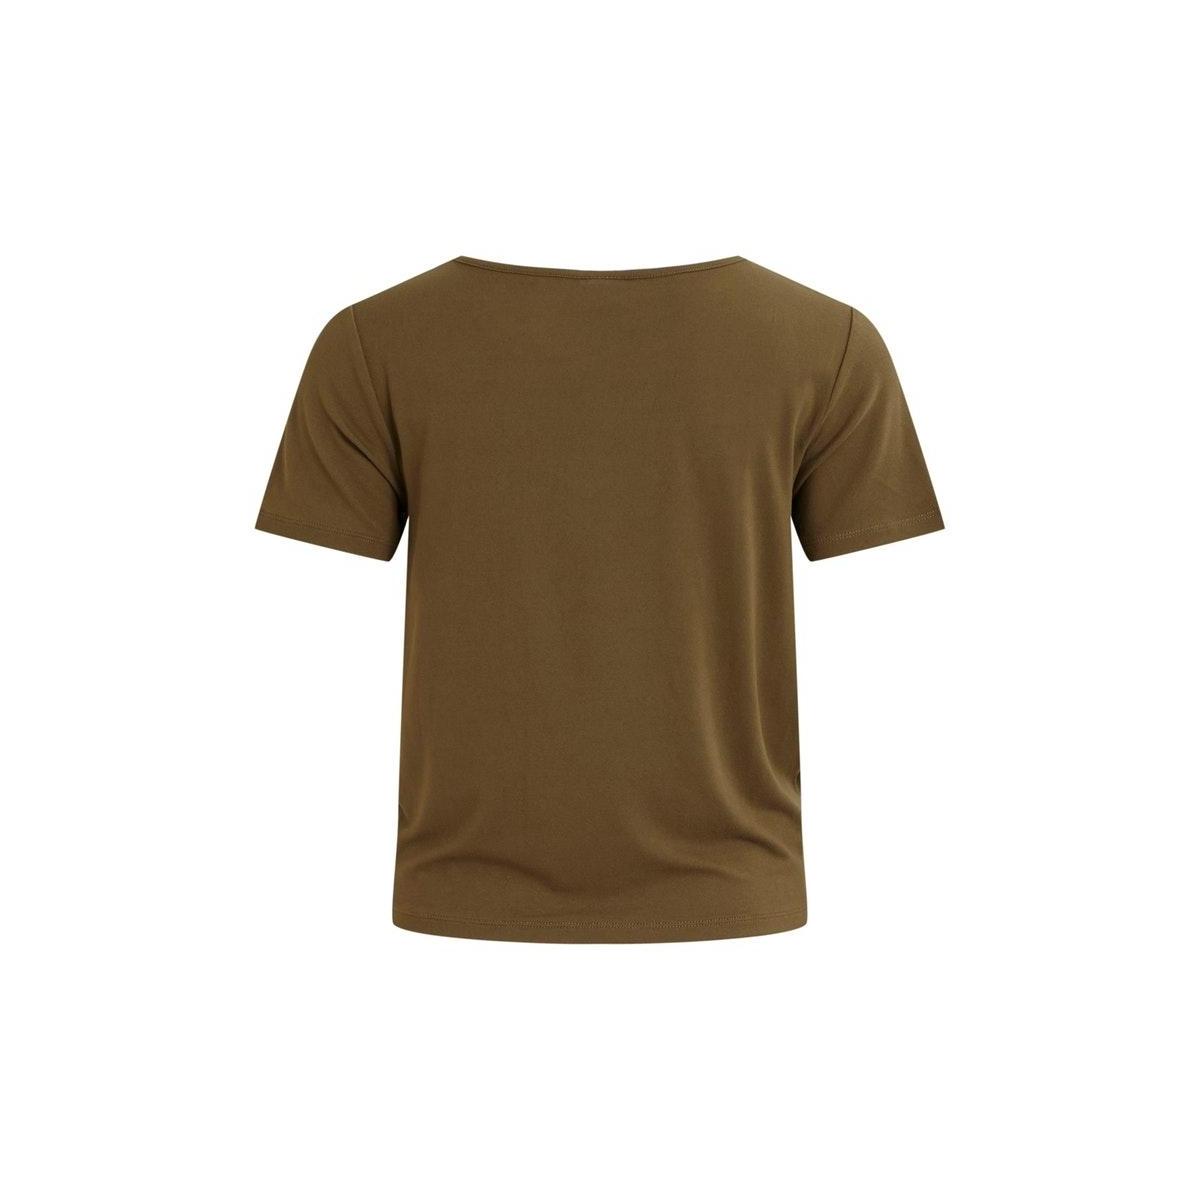 viwhisper s/s tie top/su 14057443 vila t-shirt dark olive